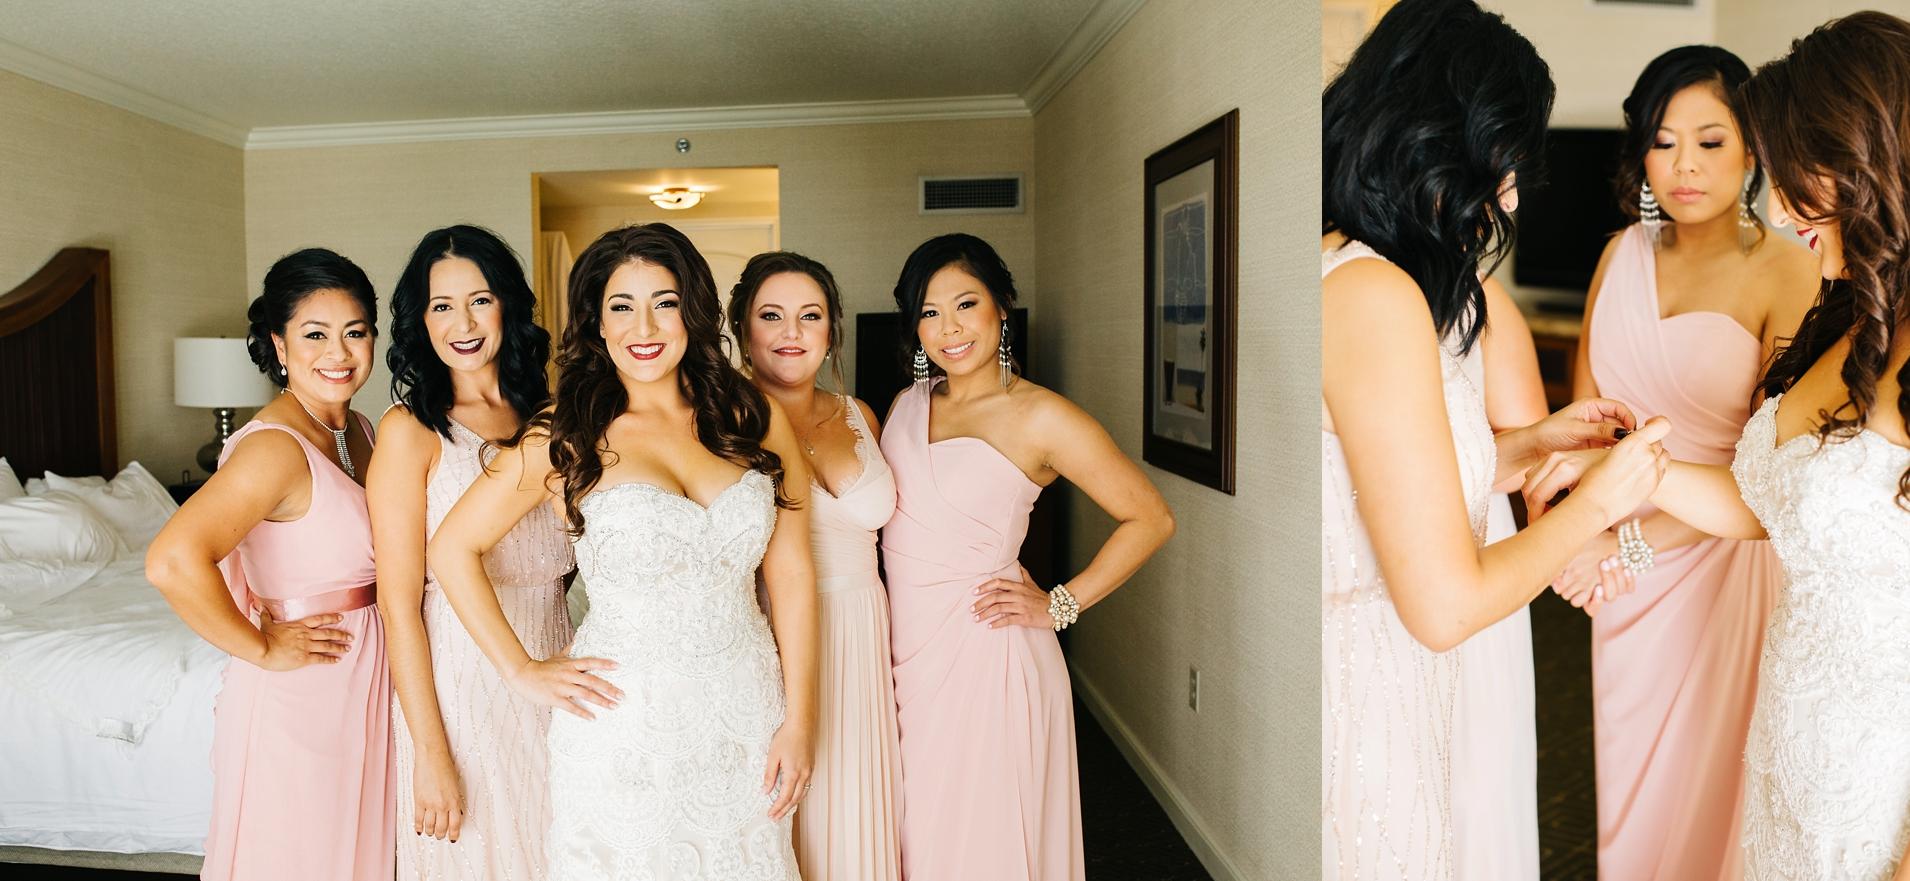 Bride and Bridesmaids in Huntington Beach, CA